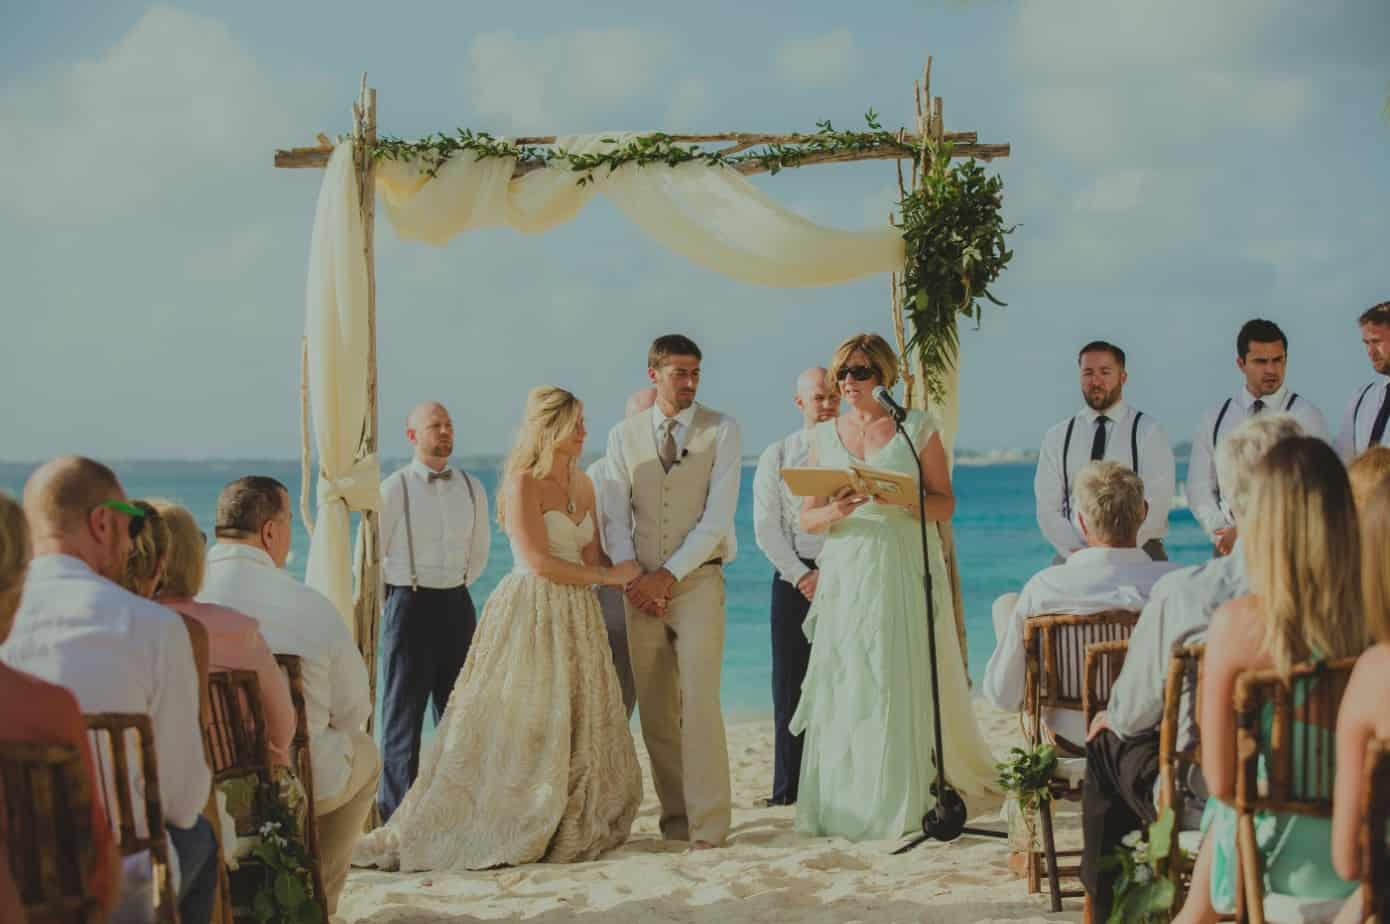 Beach Wedding Ceremony Oahu: BEAUTIFUL BOHO-CHIC GRAND CAYMAN BEACH WEDDING